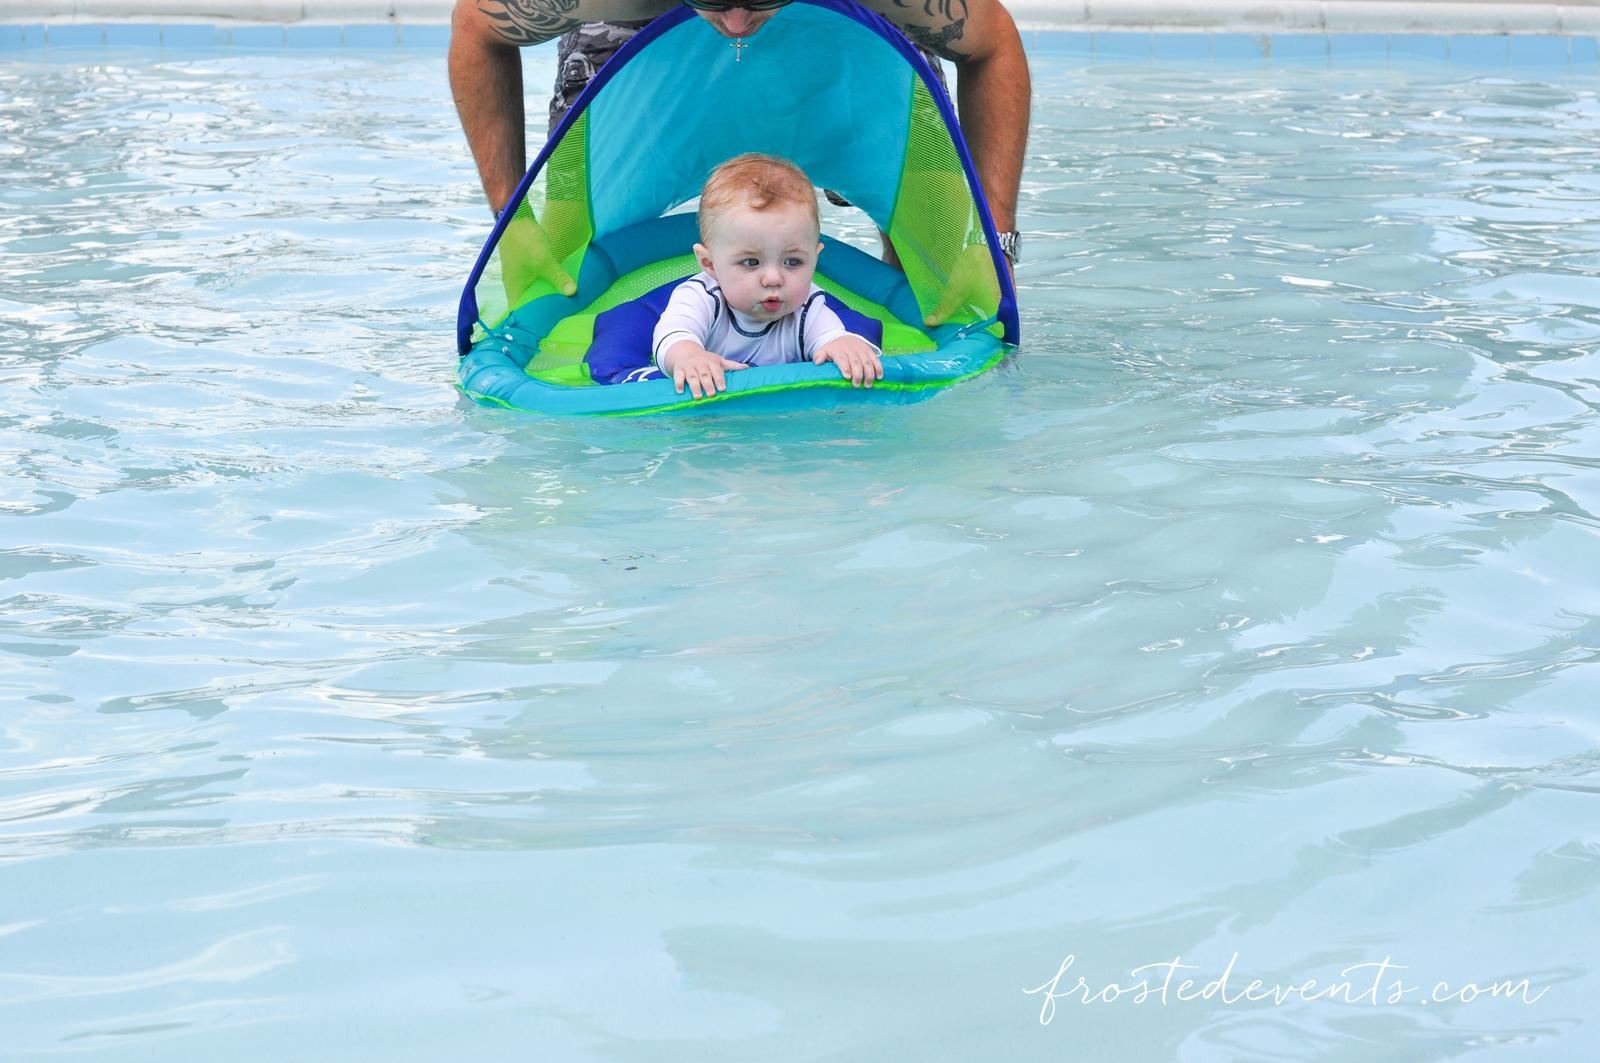 Swimways National Swim Day Teaching Kids to Swim